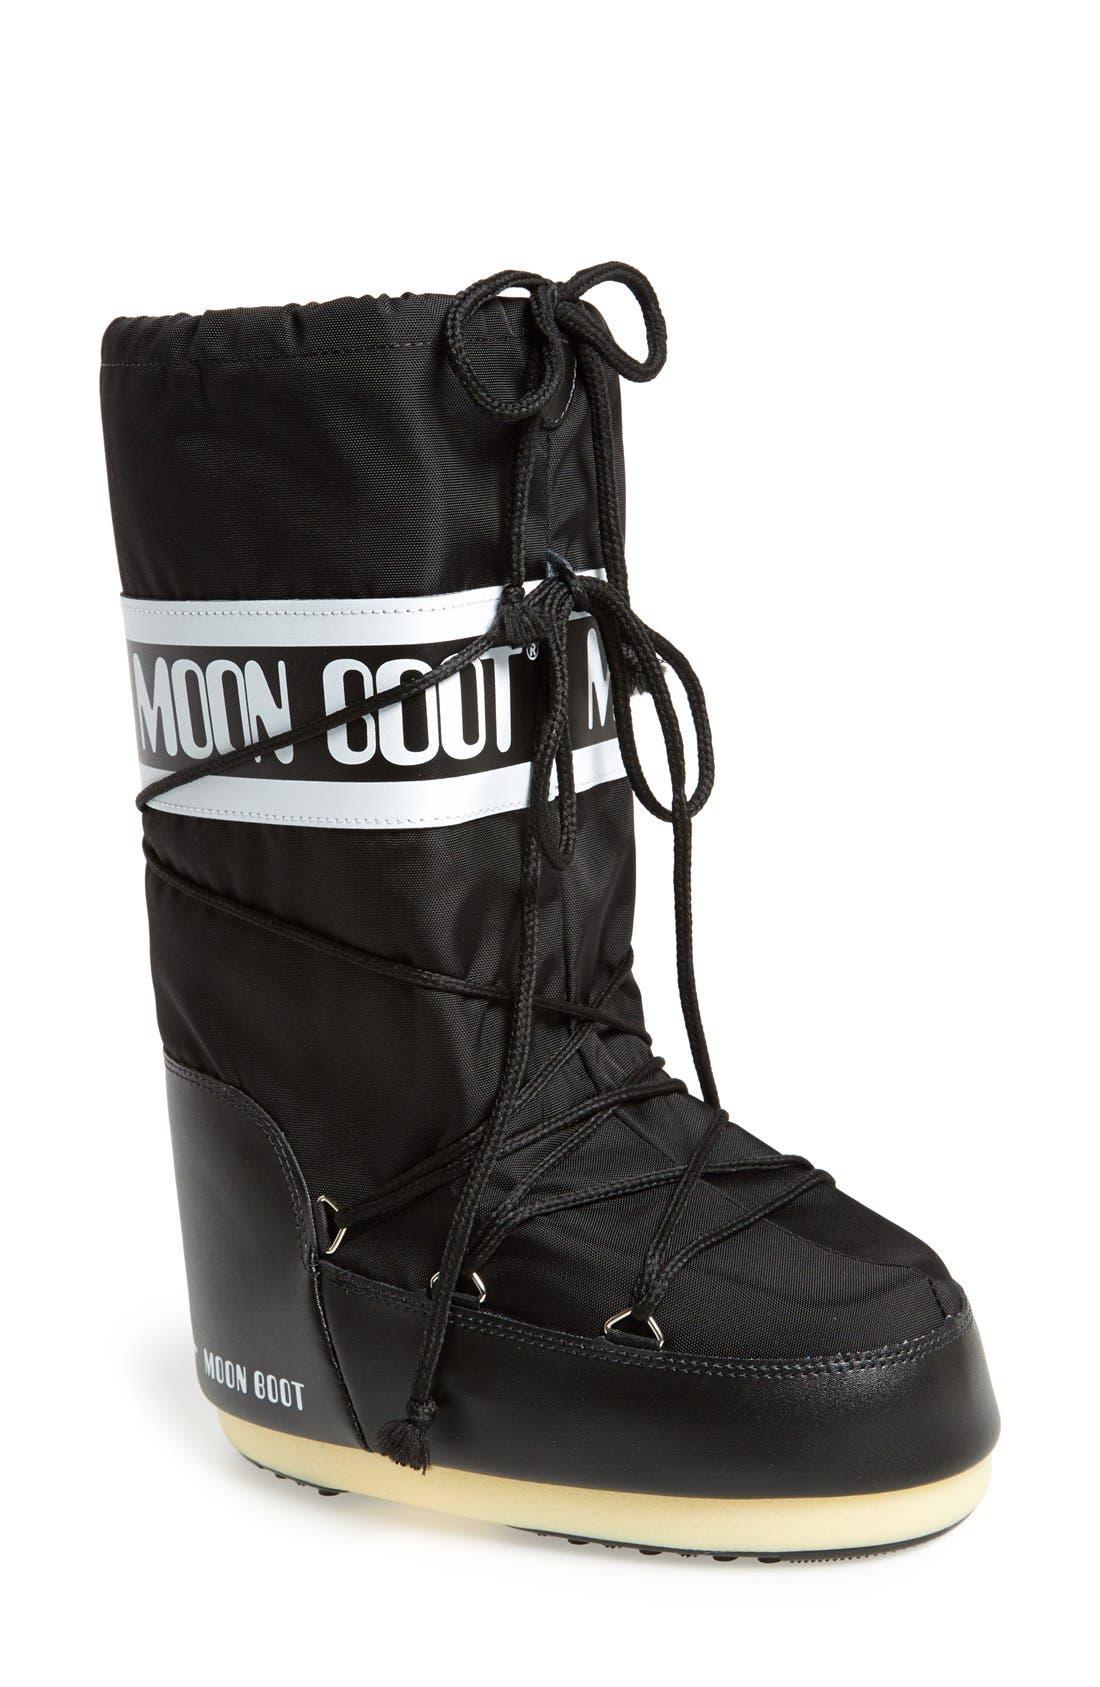 Main Image - Tecnica® 'Original' Moon Boot®